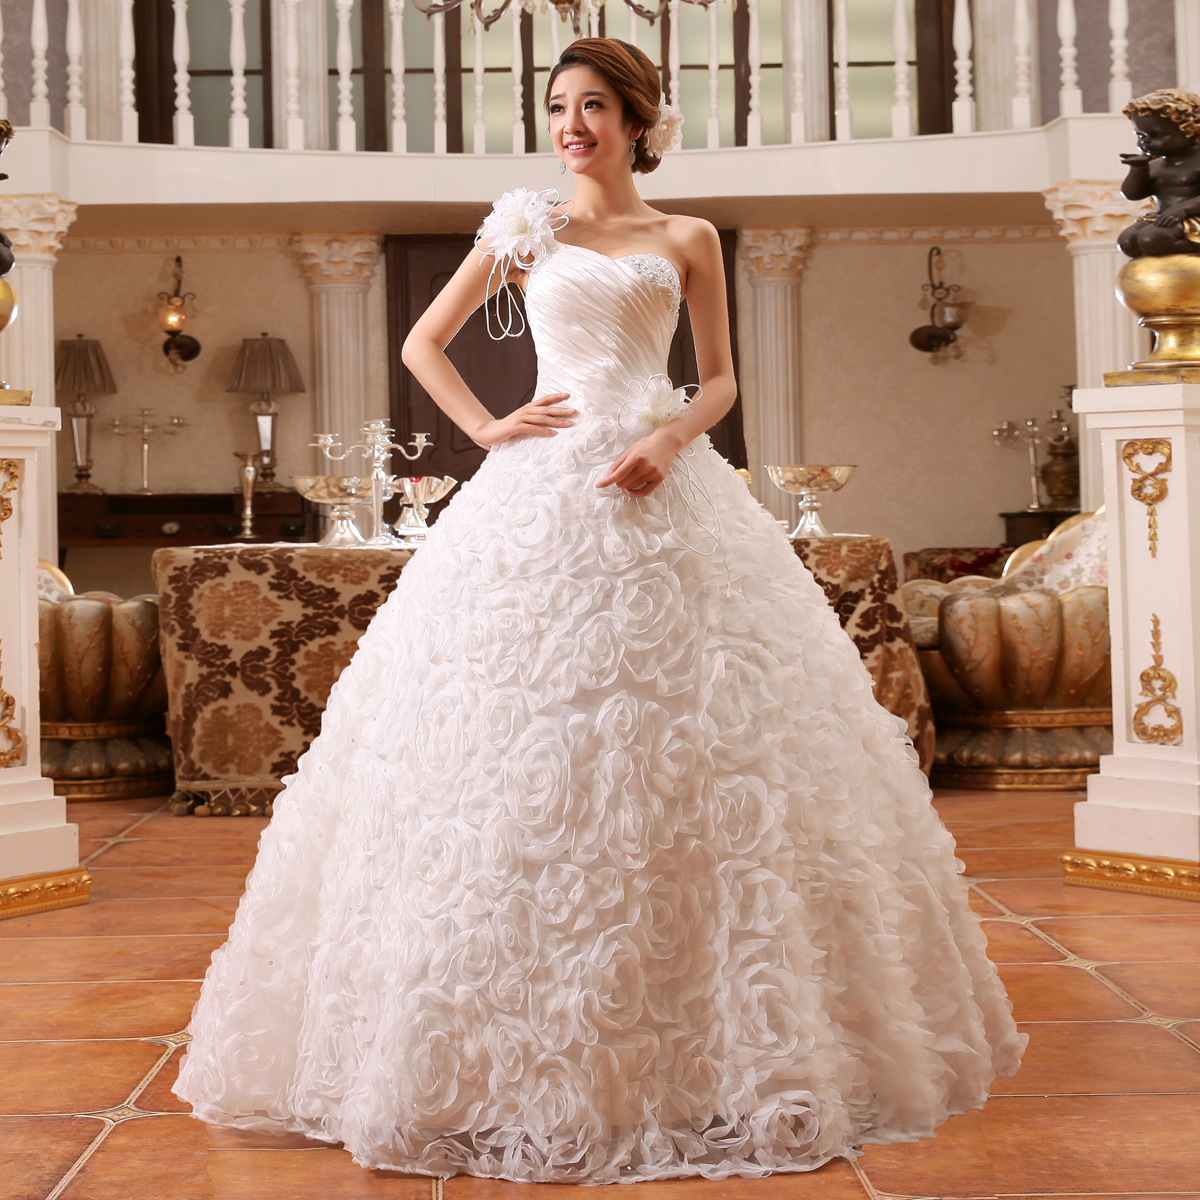 Suzhou wedding dress 2015 one shoulder strap slim princess for One strap wedding dress